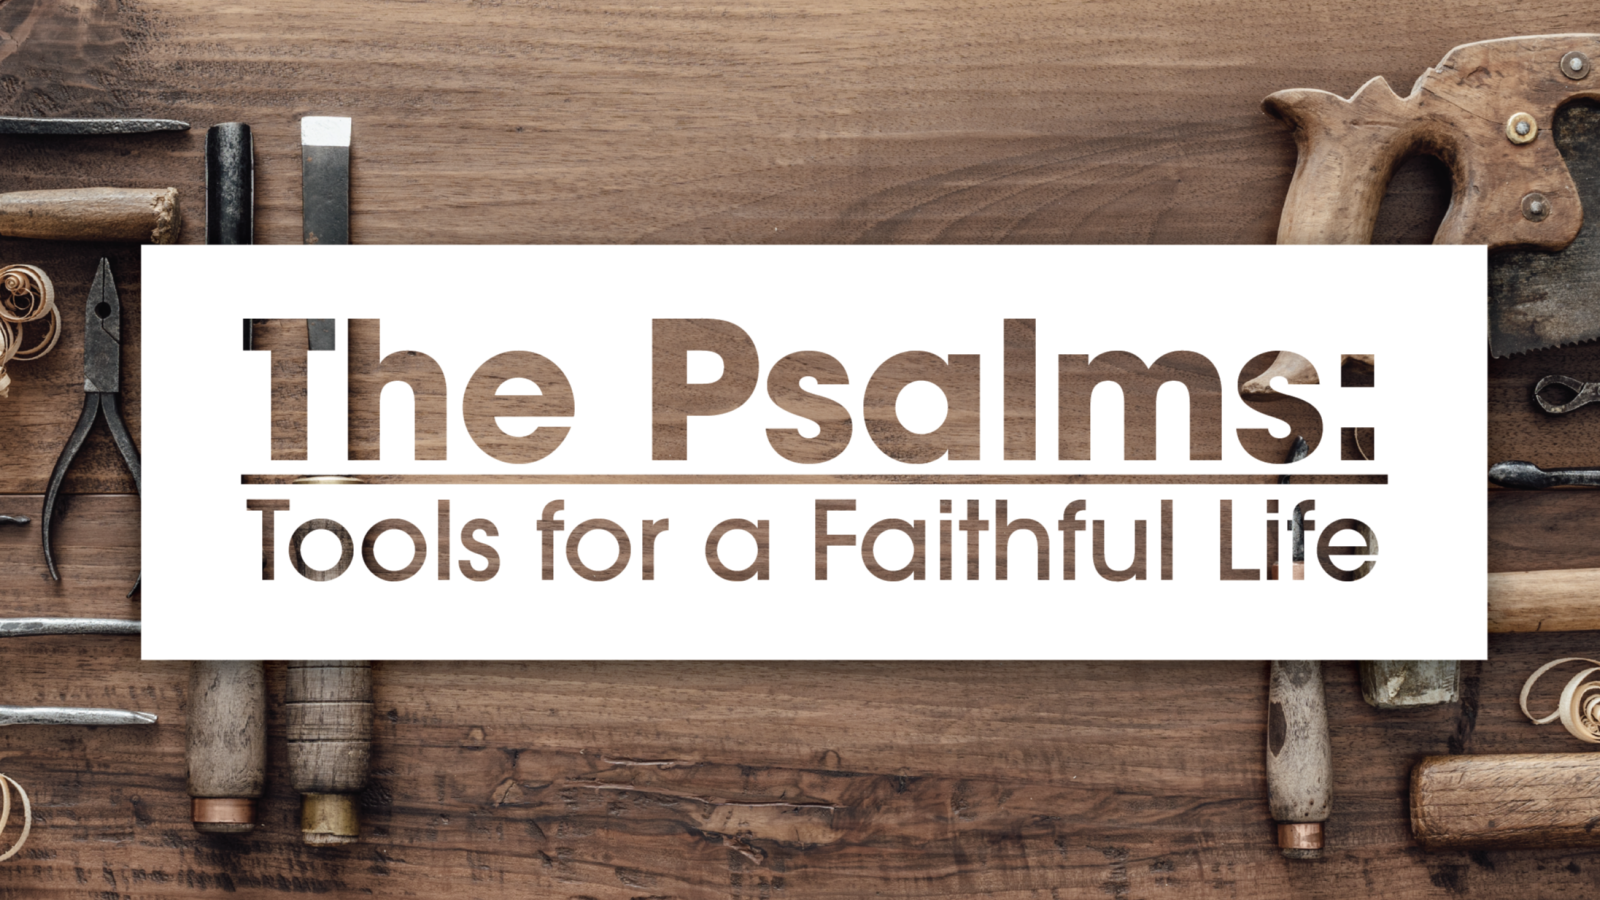 The Psalms: Tools For A Faithful Life